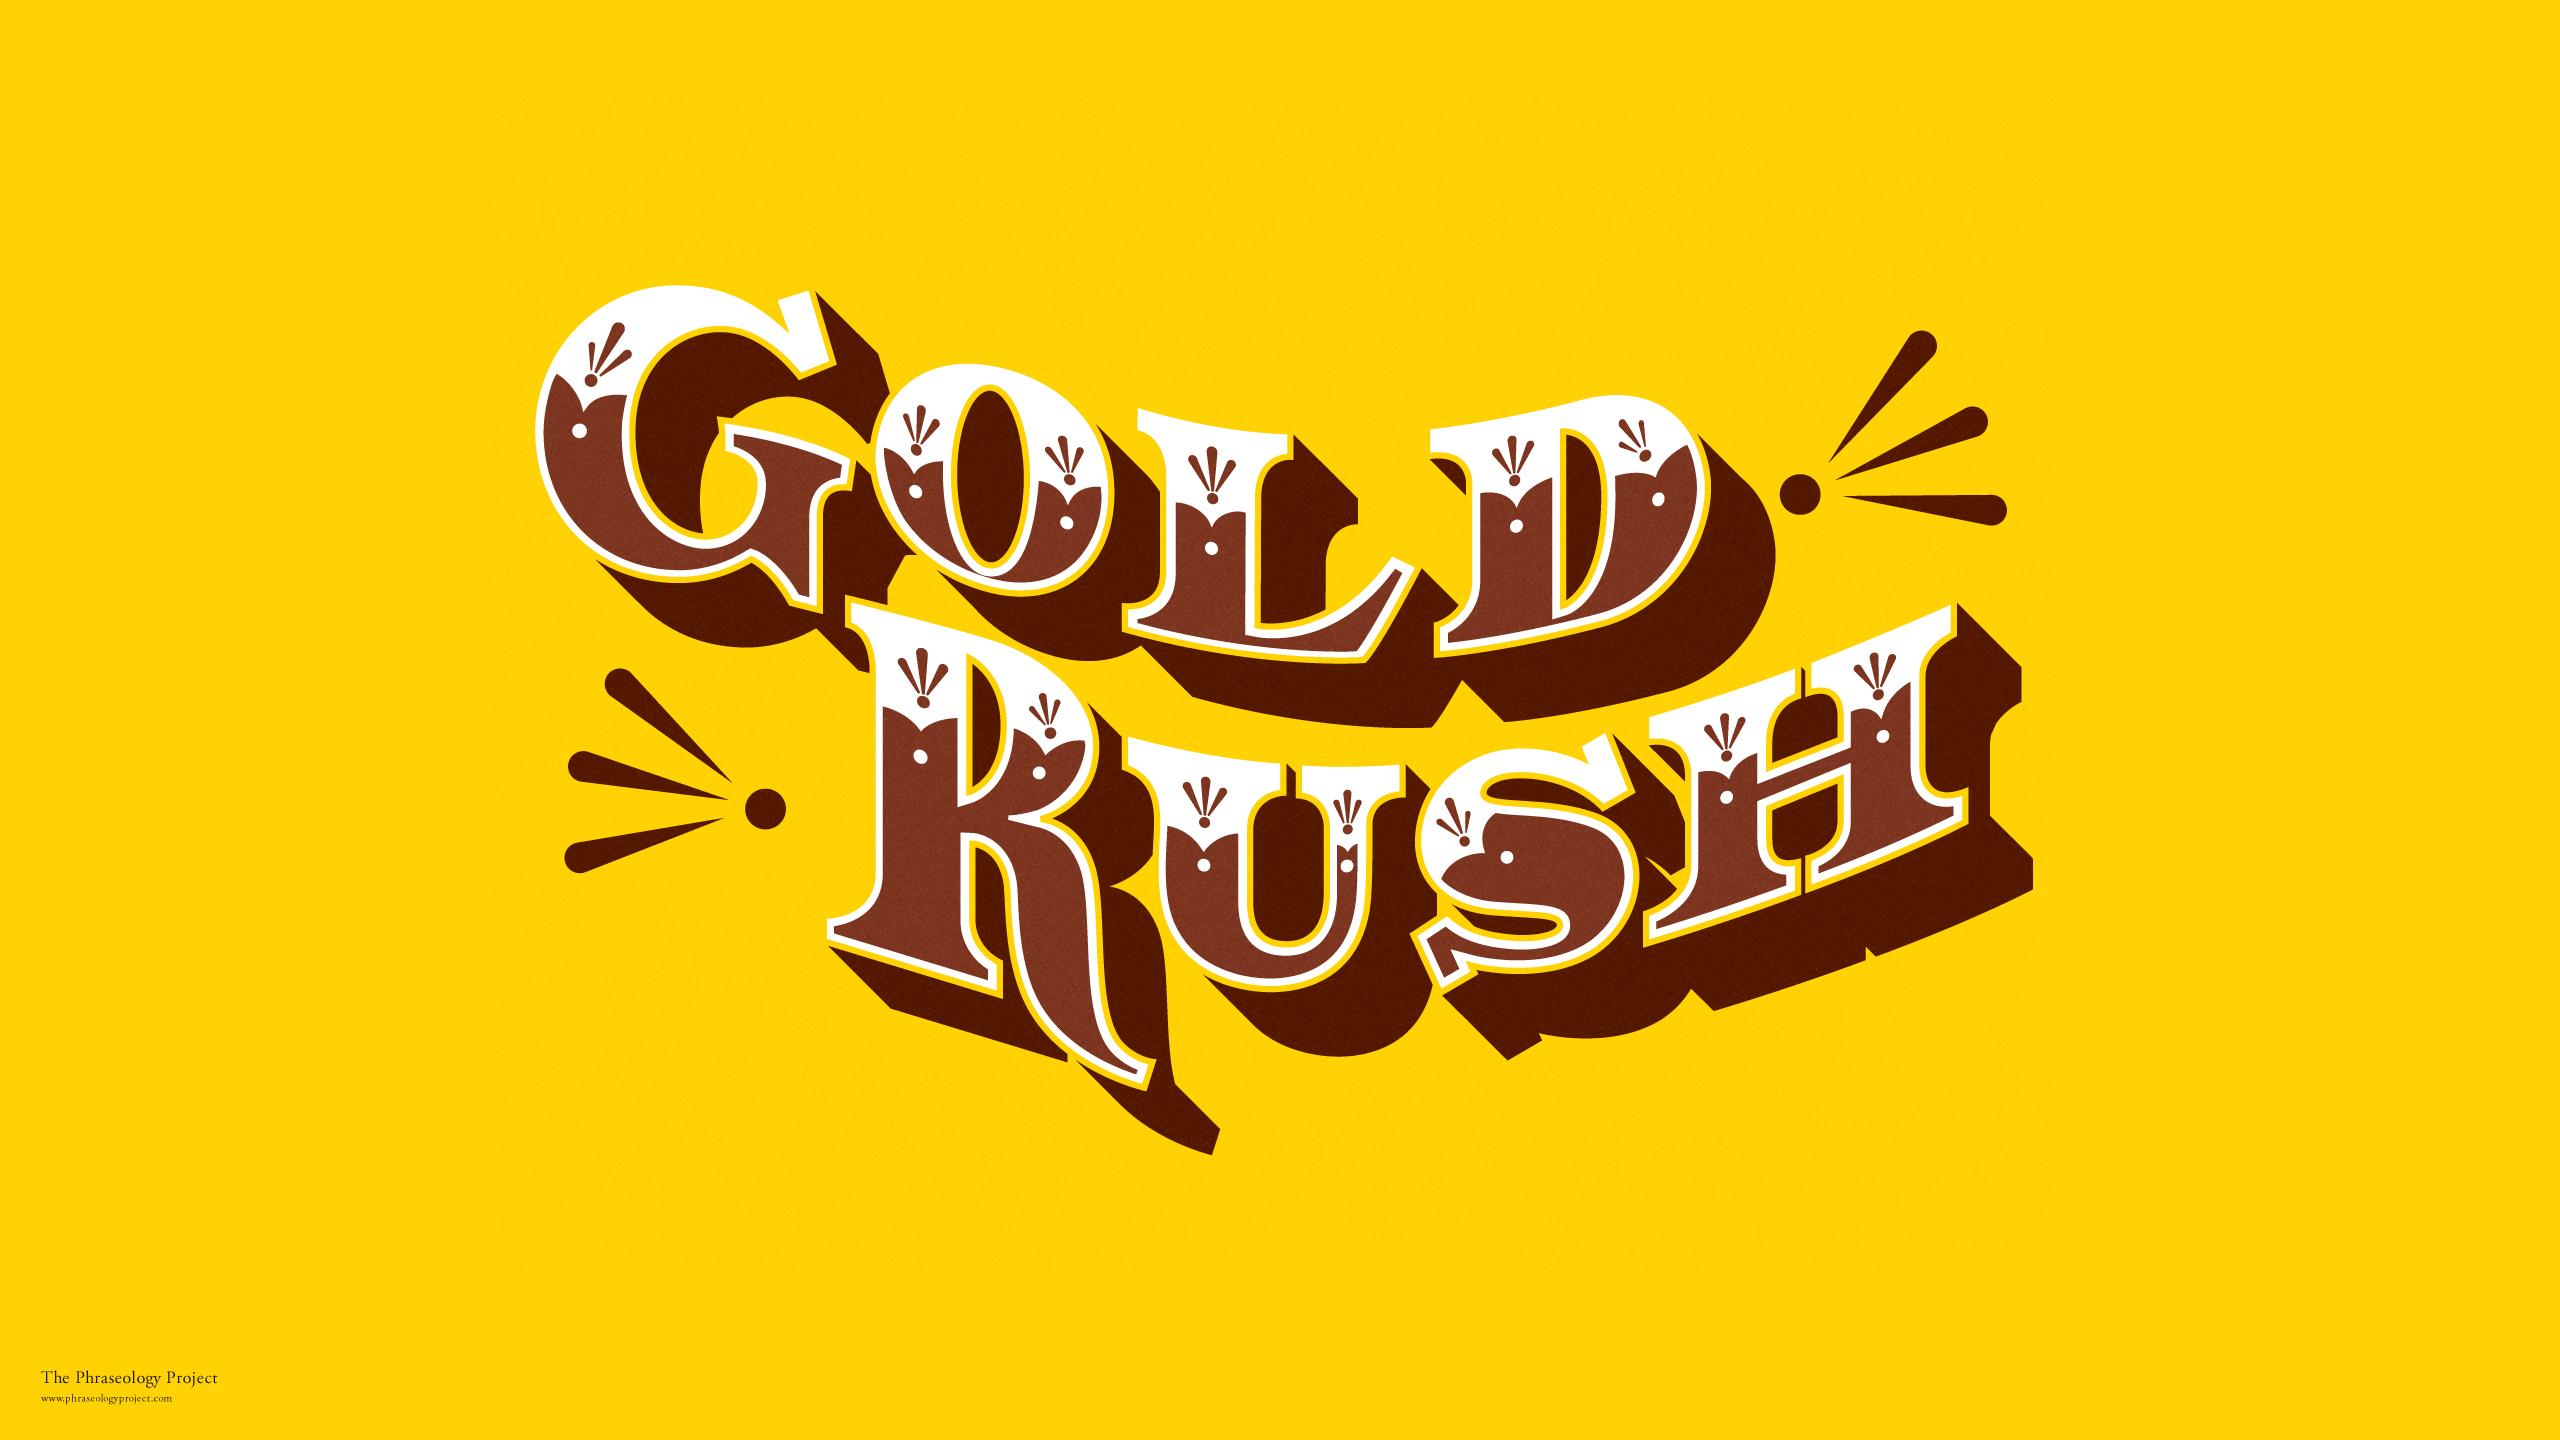 Download Gold Rush Wallpaper Gallery 2560x1440